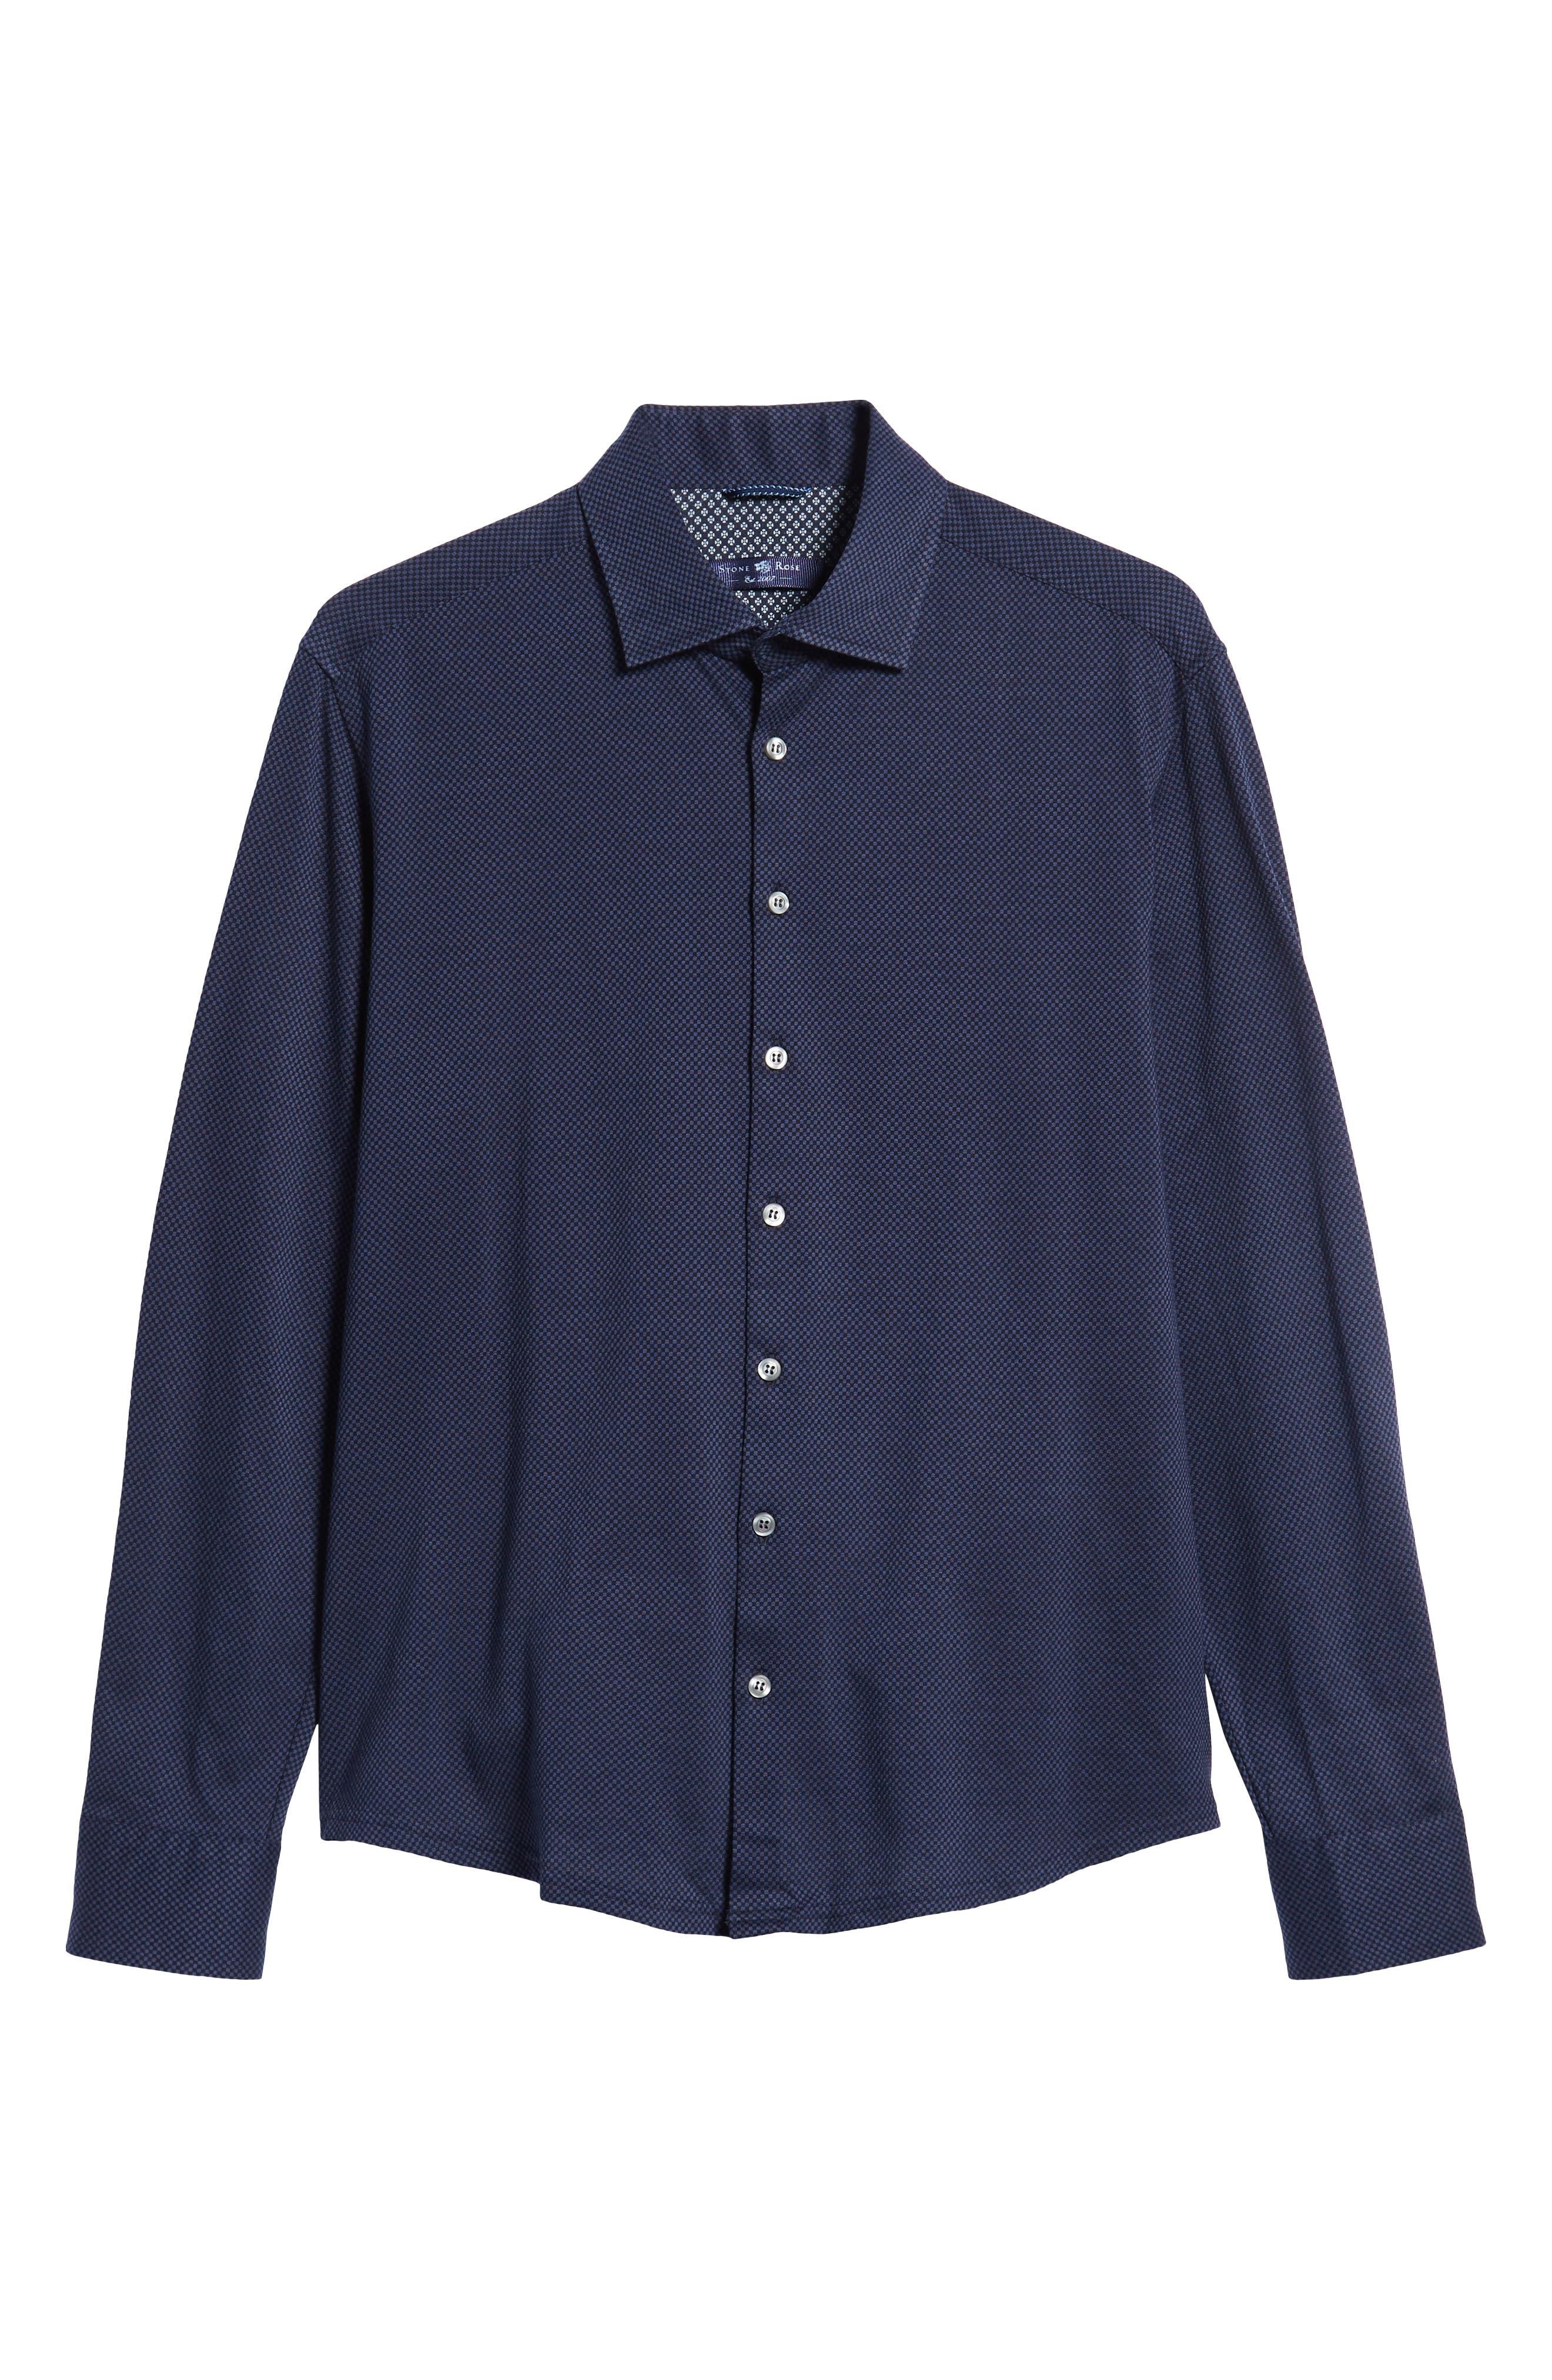 STONE ROSE,                             Trim Fit Knit Sport Shirt,                             Alternate thumbnail 5, color,                             410